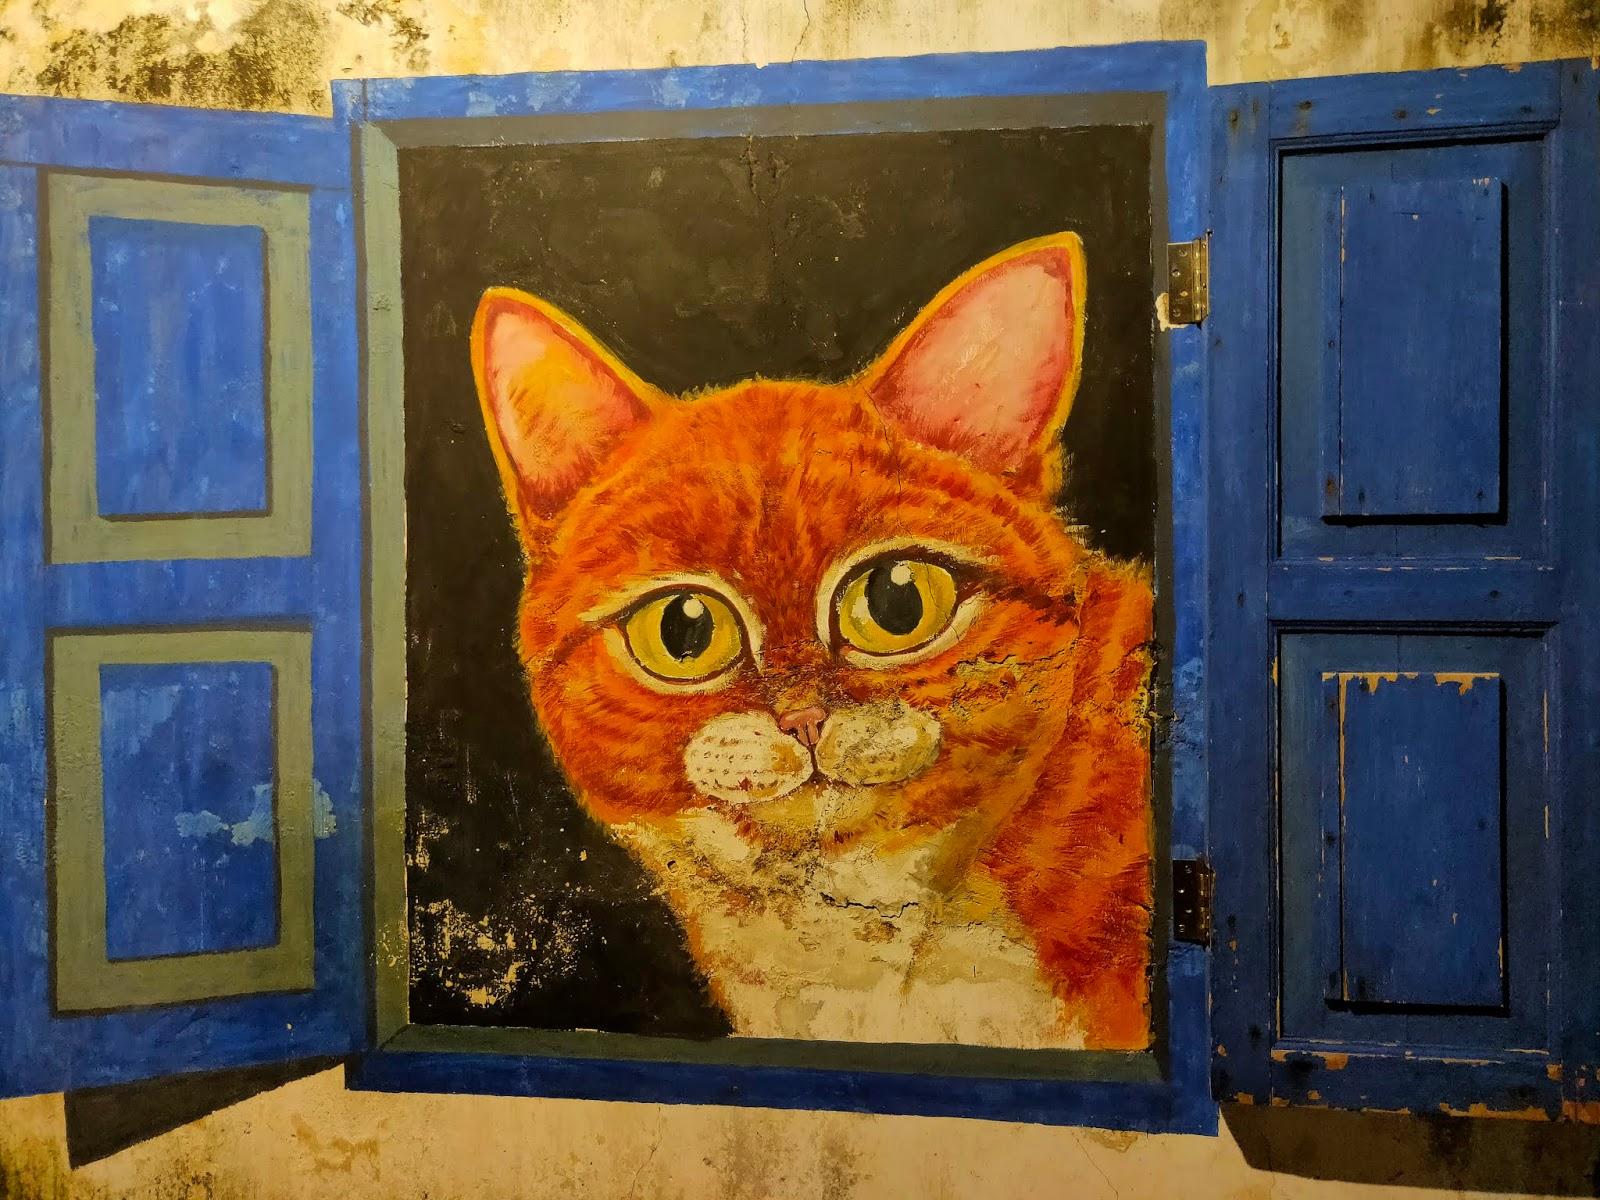 penang street art (9)